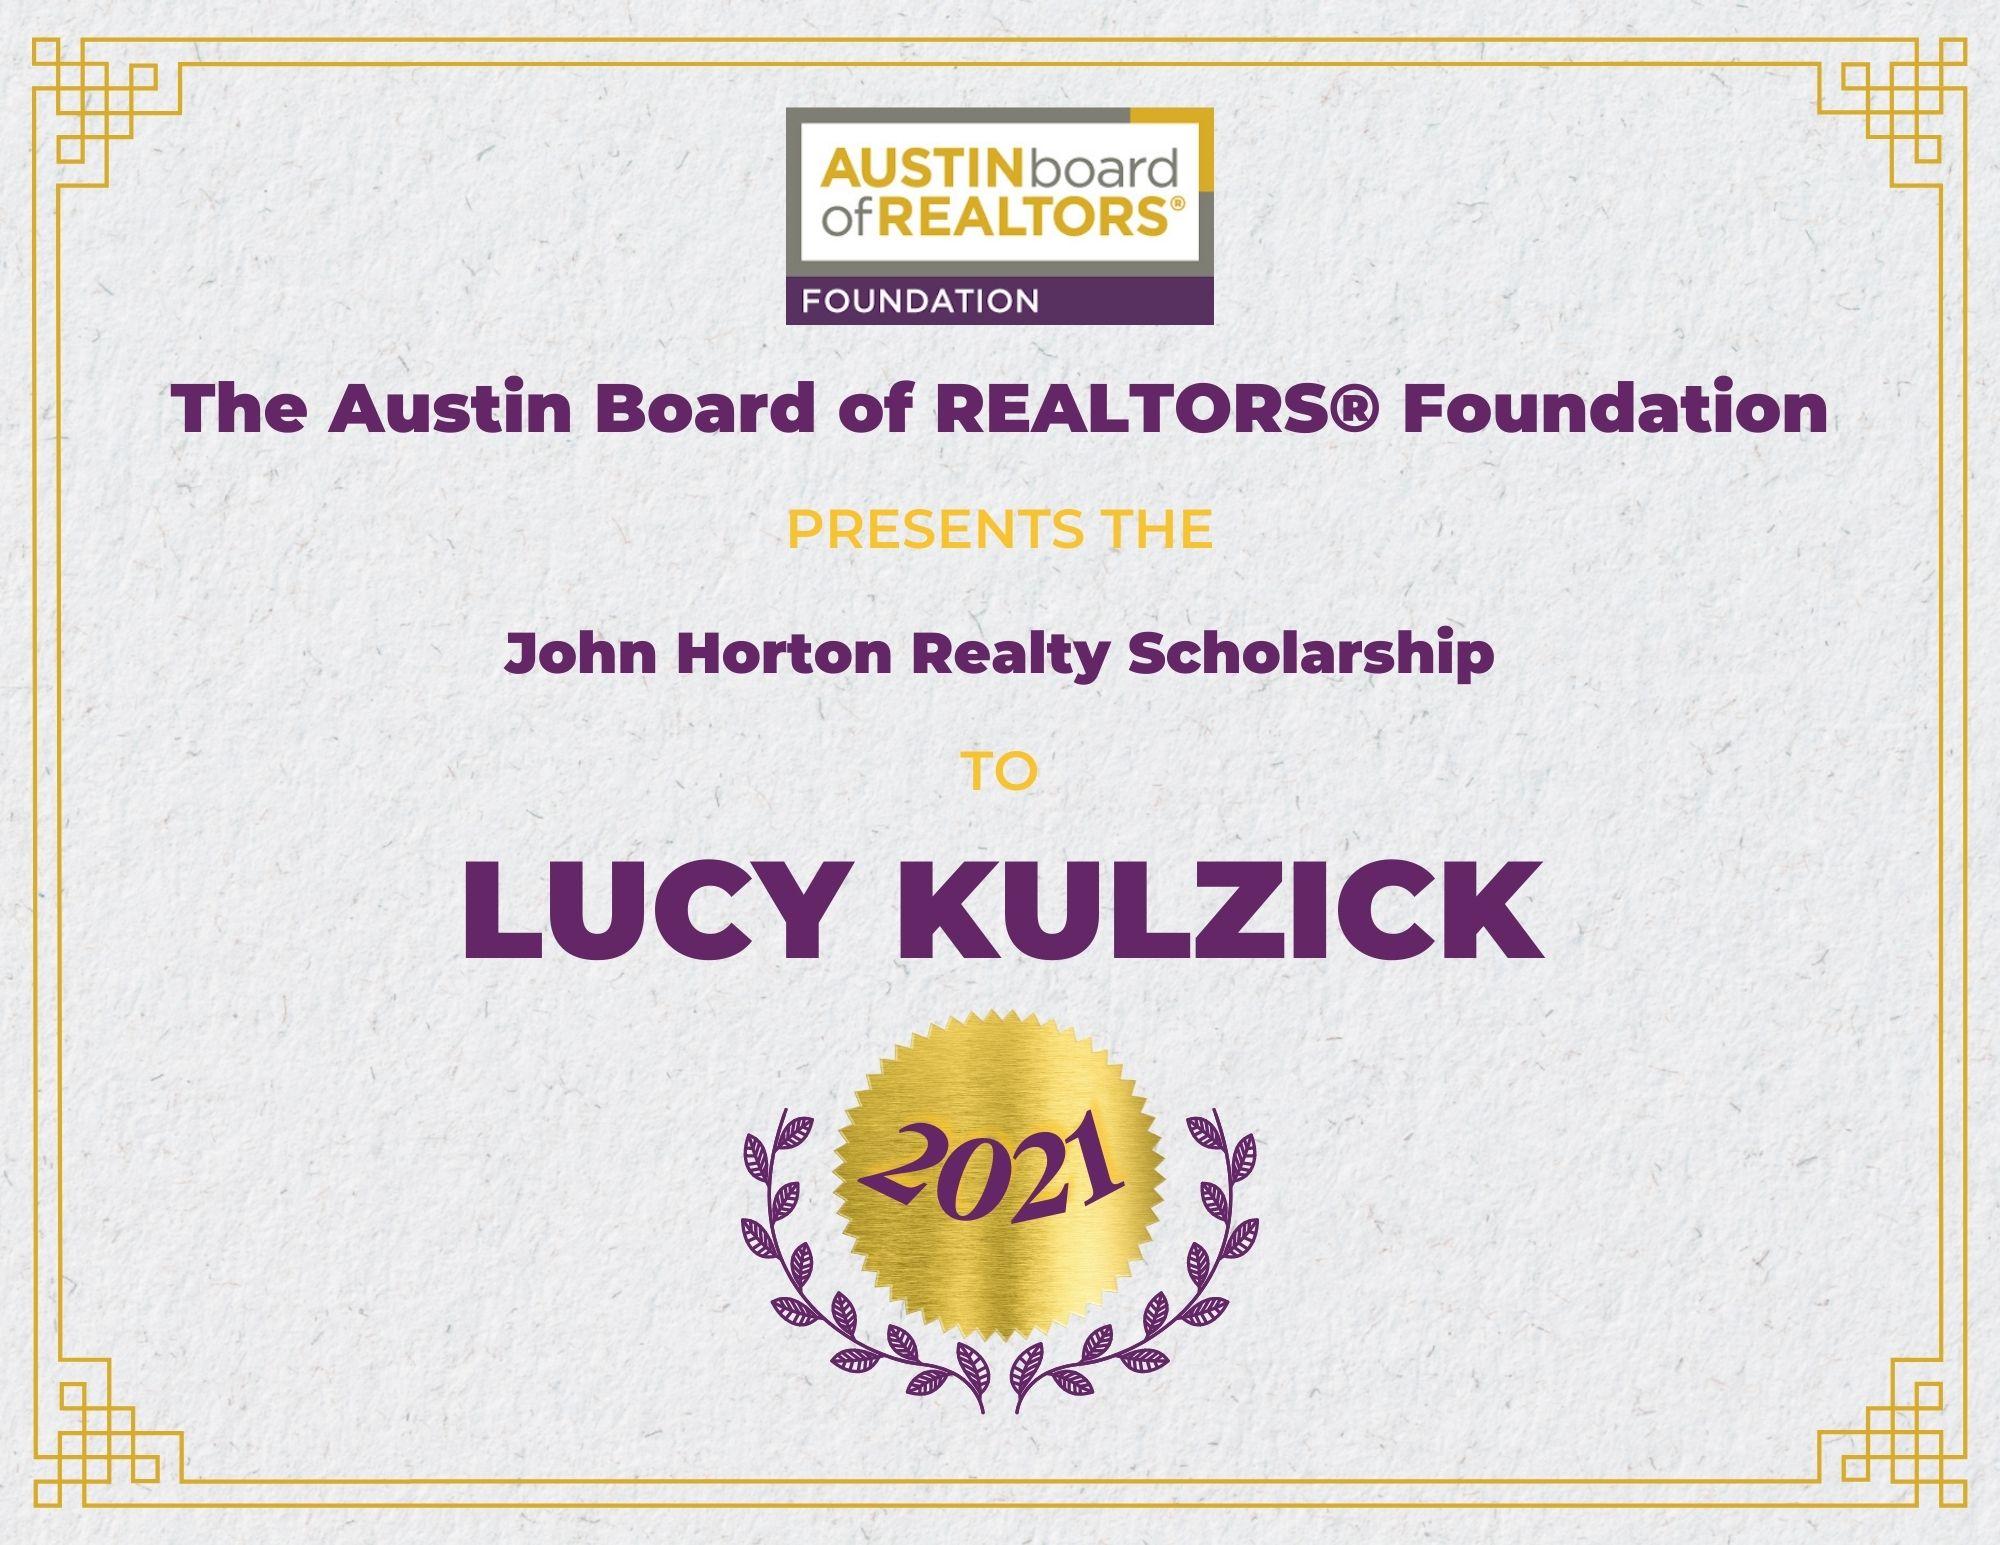 2021 Fou Scholarship Certificate Lucykulzick